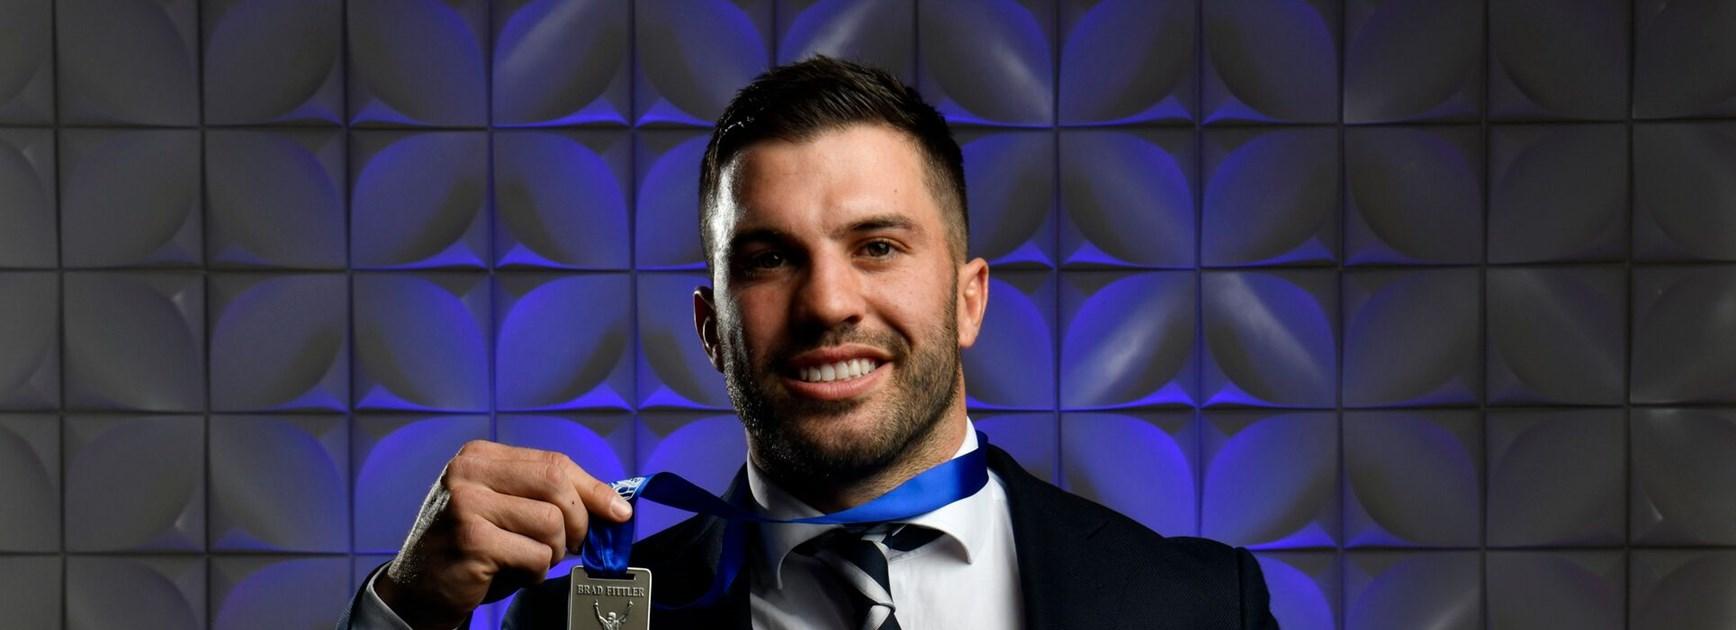 Tedesco wins back-to-back Brad Fittler Medals